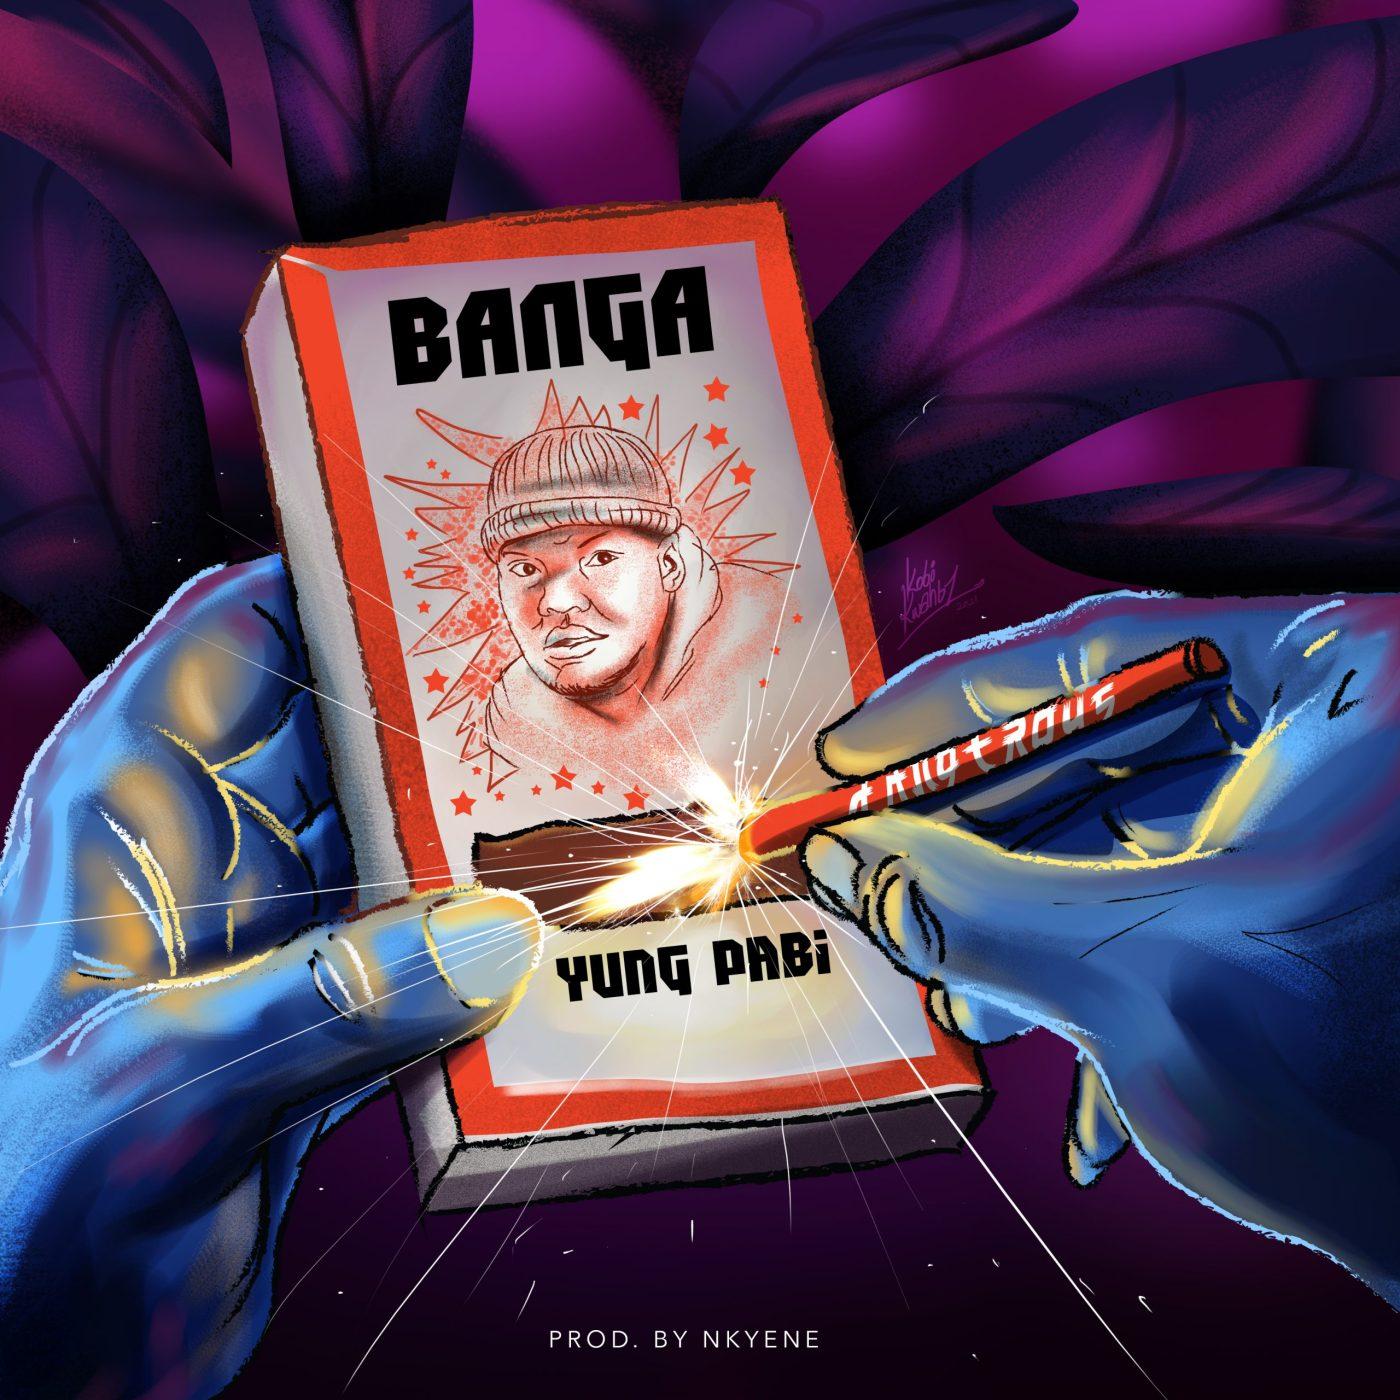 Yung Pabi Banga Prod by Nkyenewww dcleakers com  mp3 image scaled - Yung Pabi - Banga